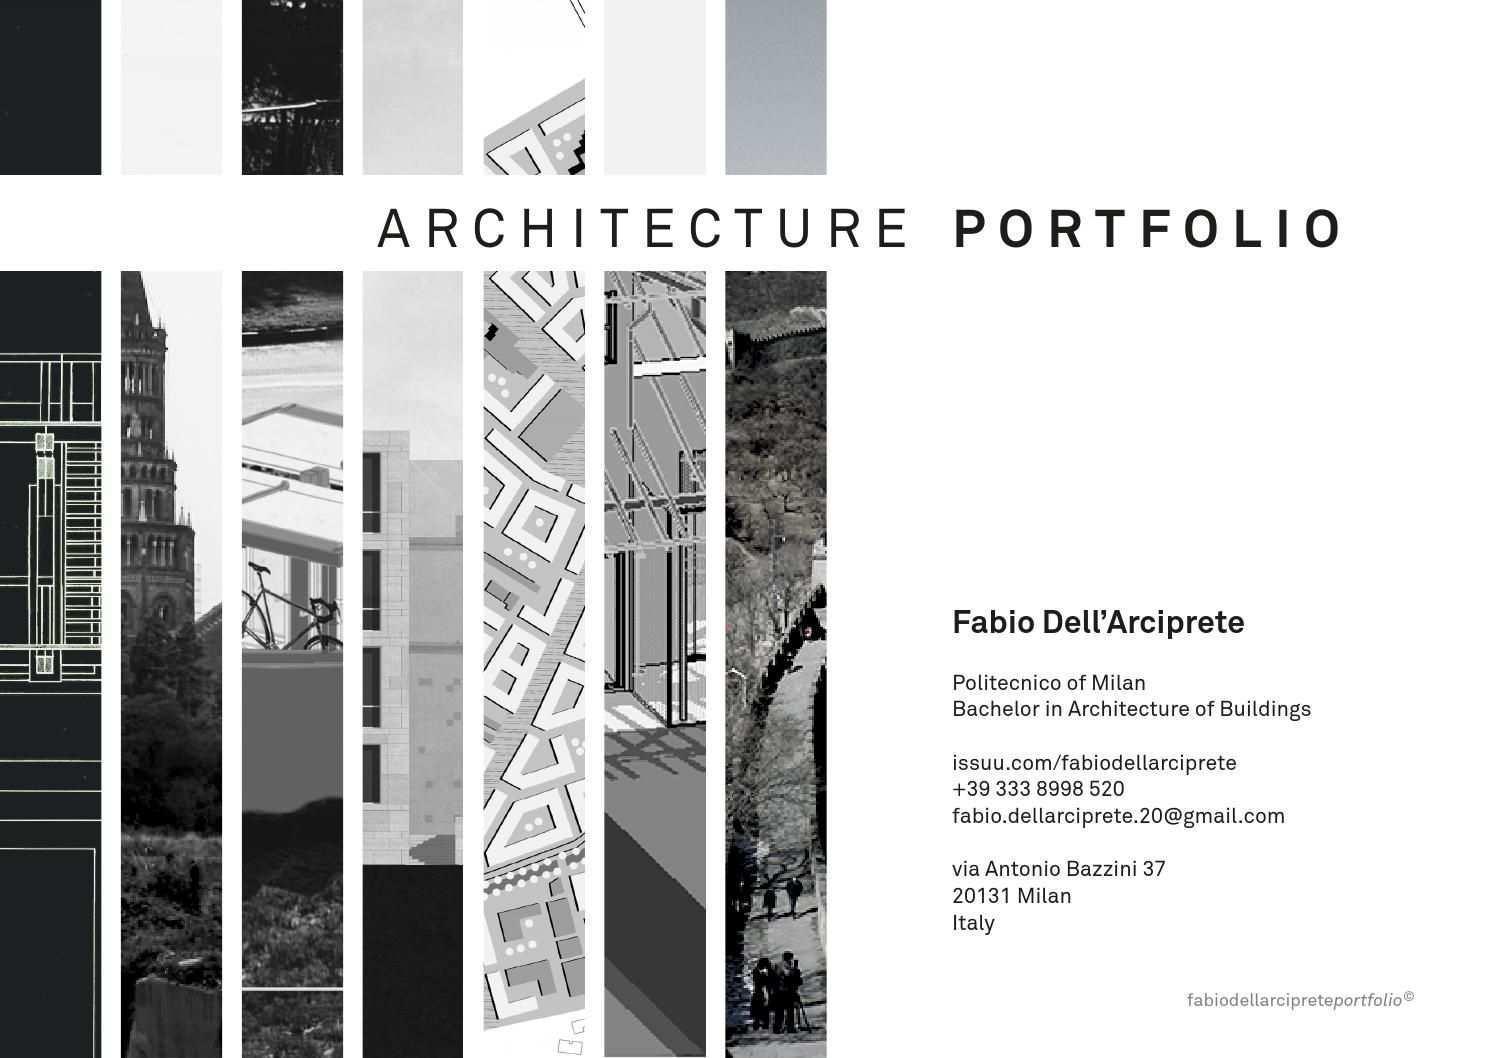 Architecture Portfolio Architektur Portfolio Portfolio Design Layouts Und Architektur Portfolio Layout